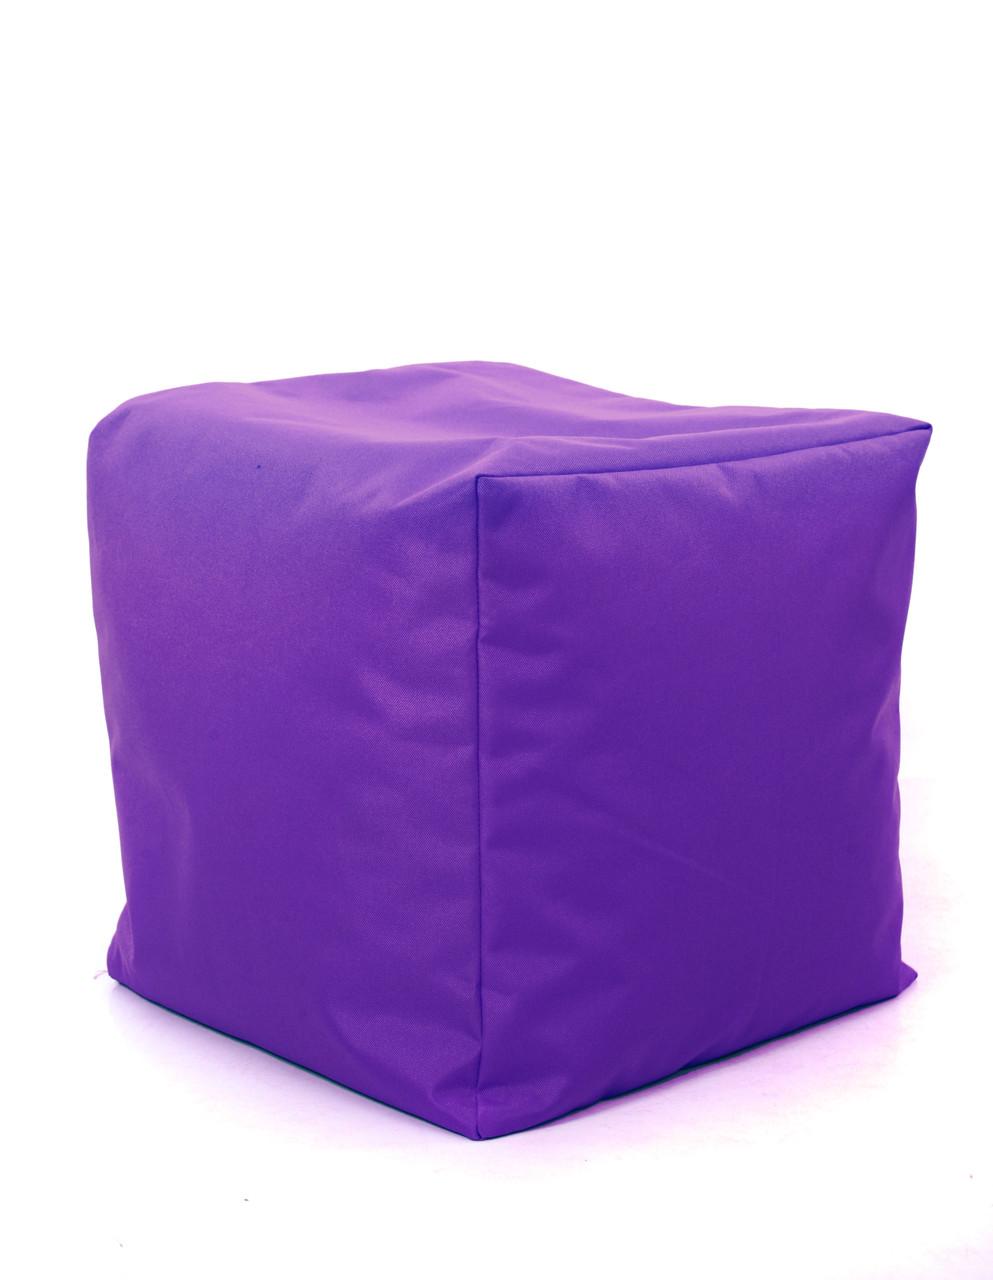 Пуф куб Оксфорд 40х40х40 см, фиолетовый